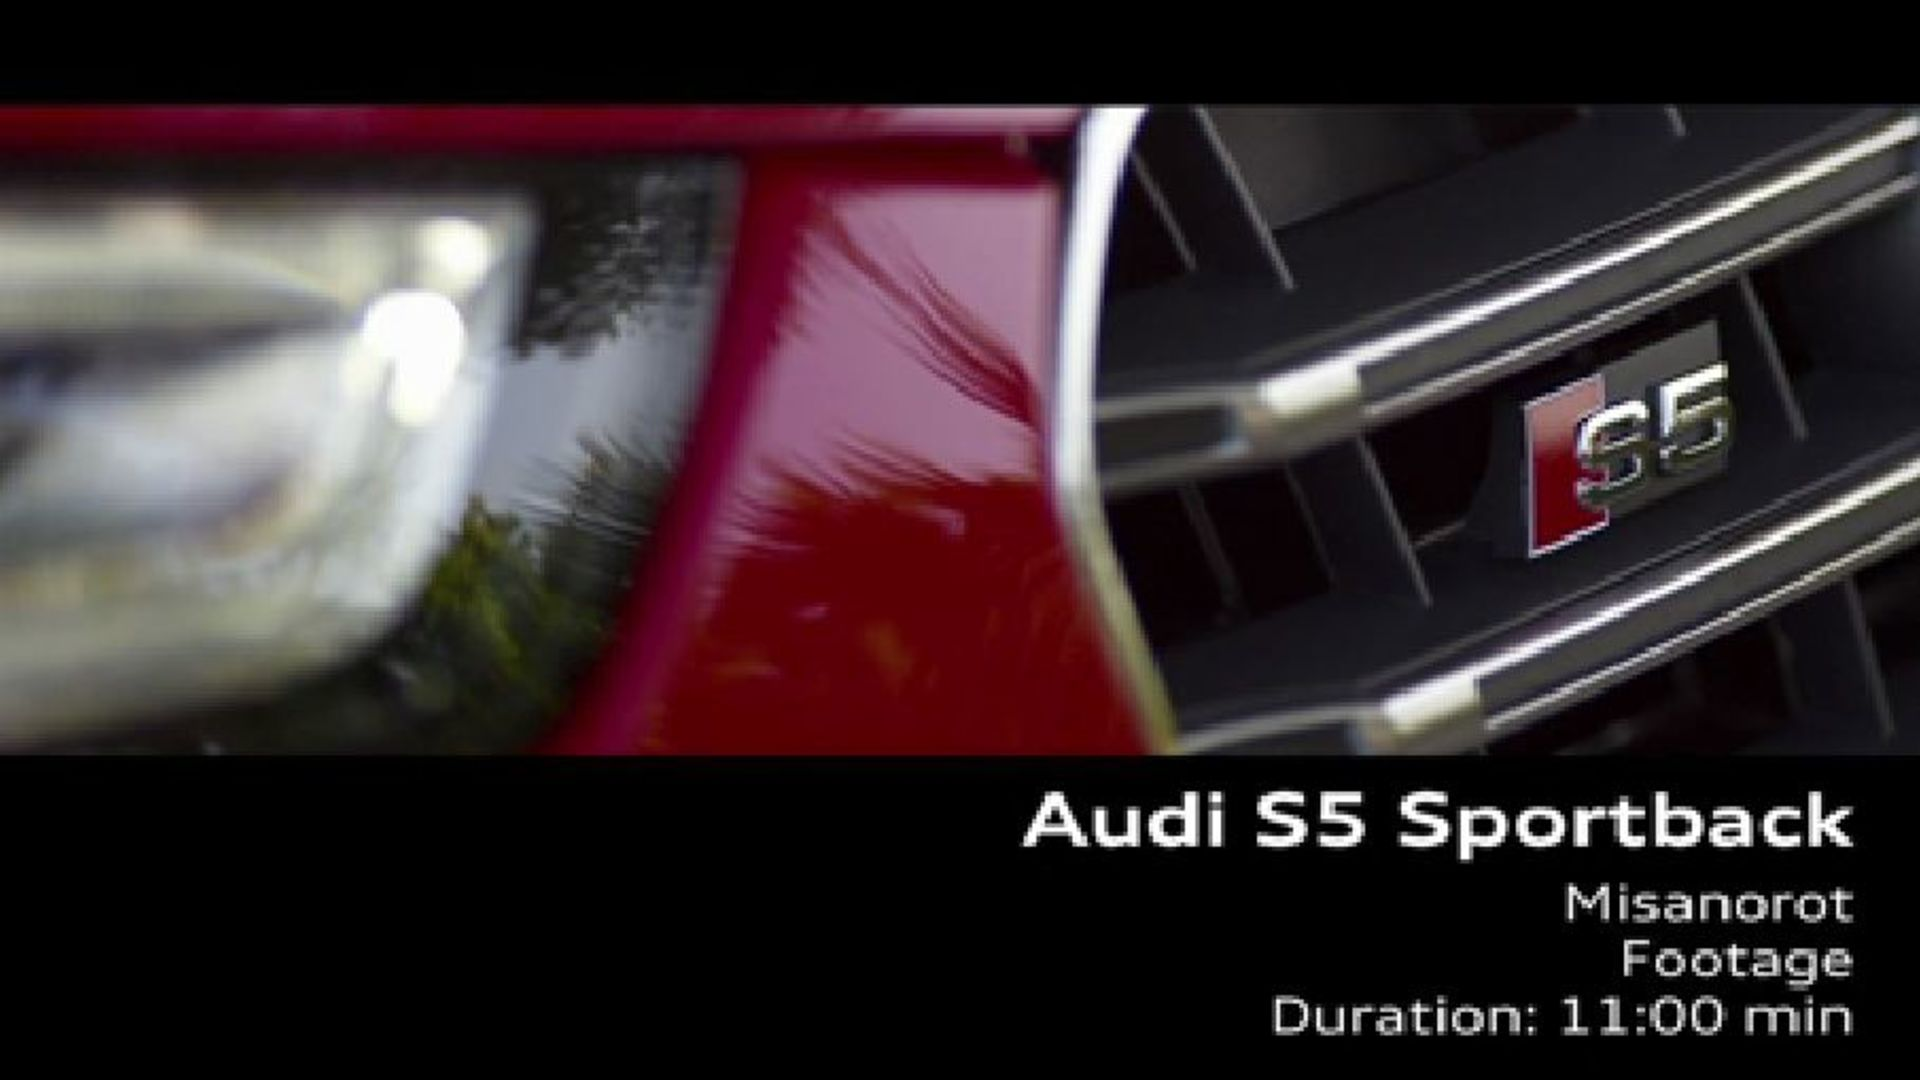 Audi S5 Sportback - Footage